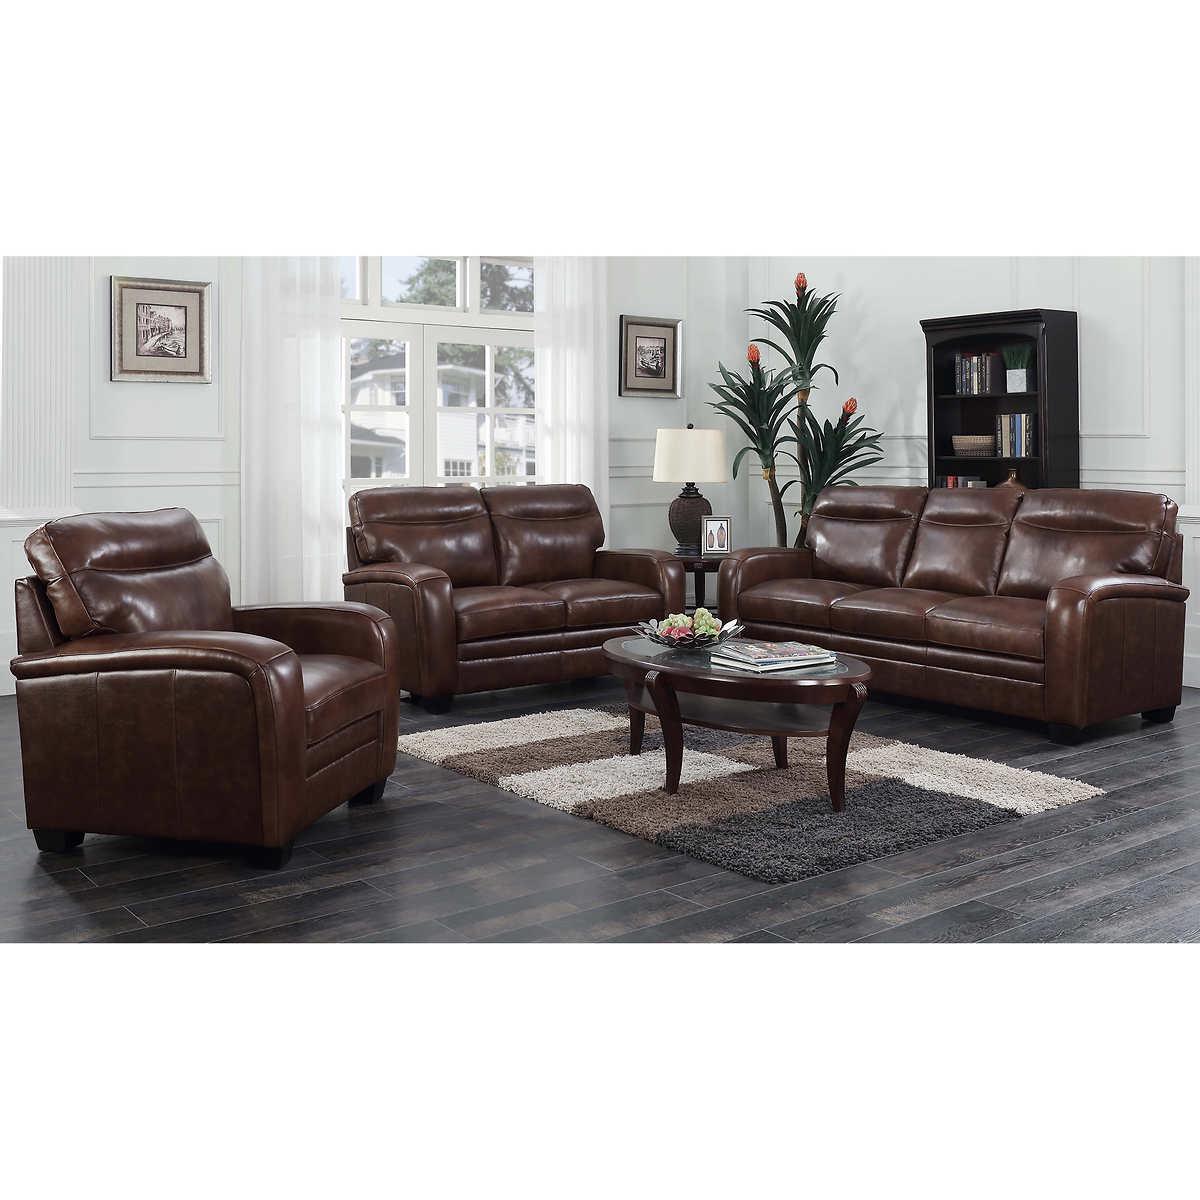 Montecello 3-piece Top Grain Leather Living Room Set